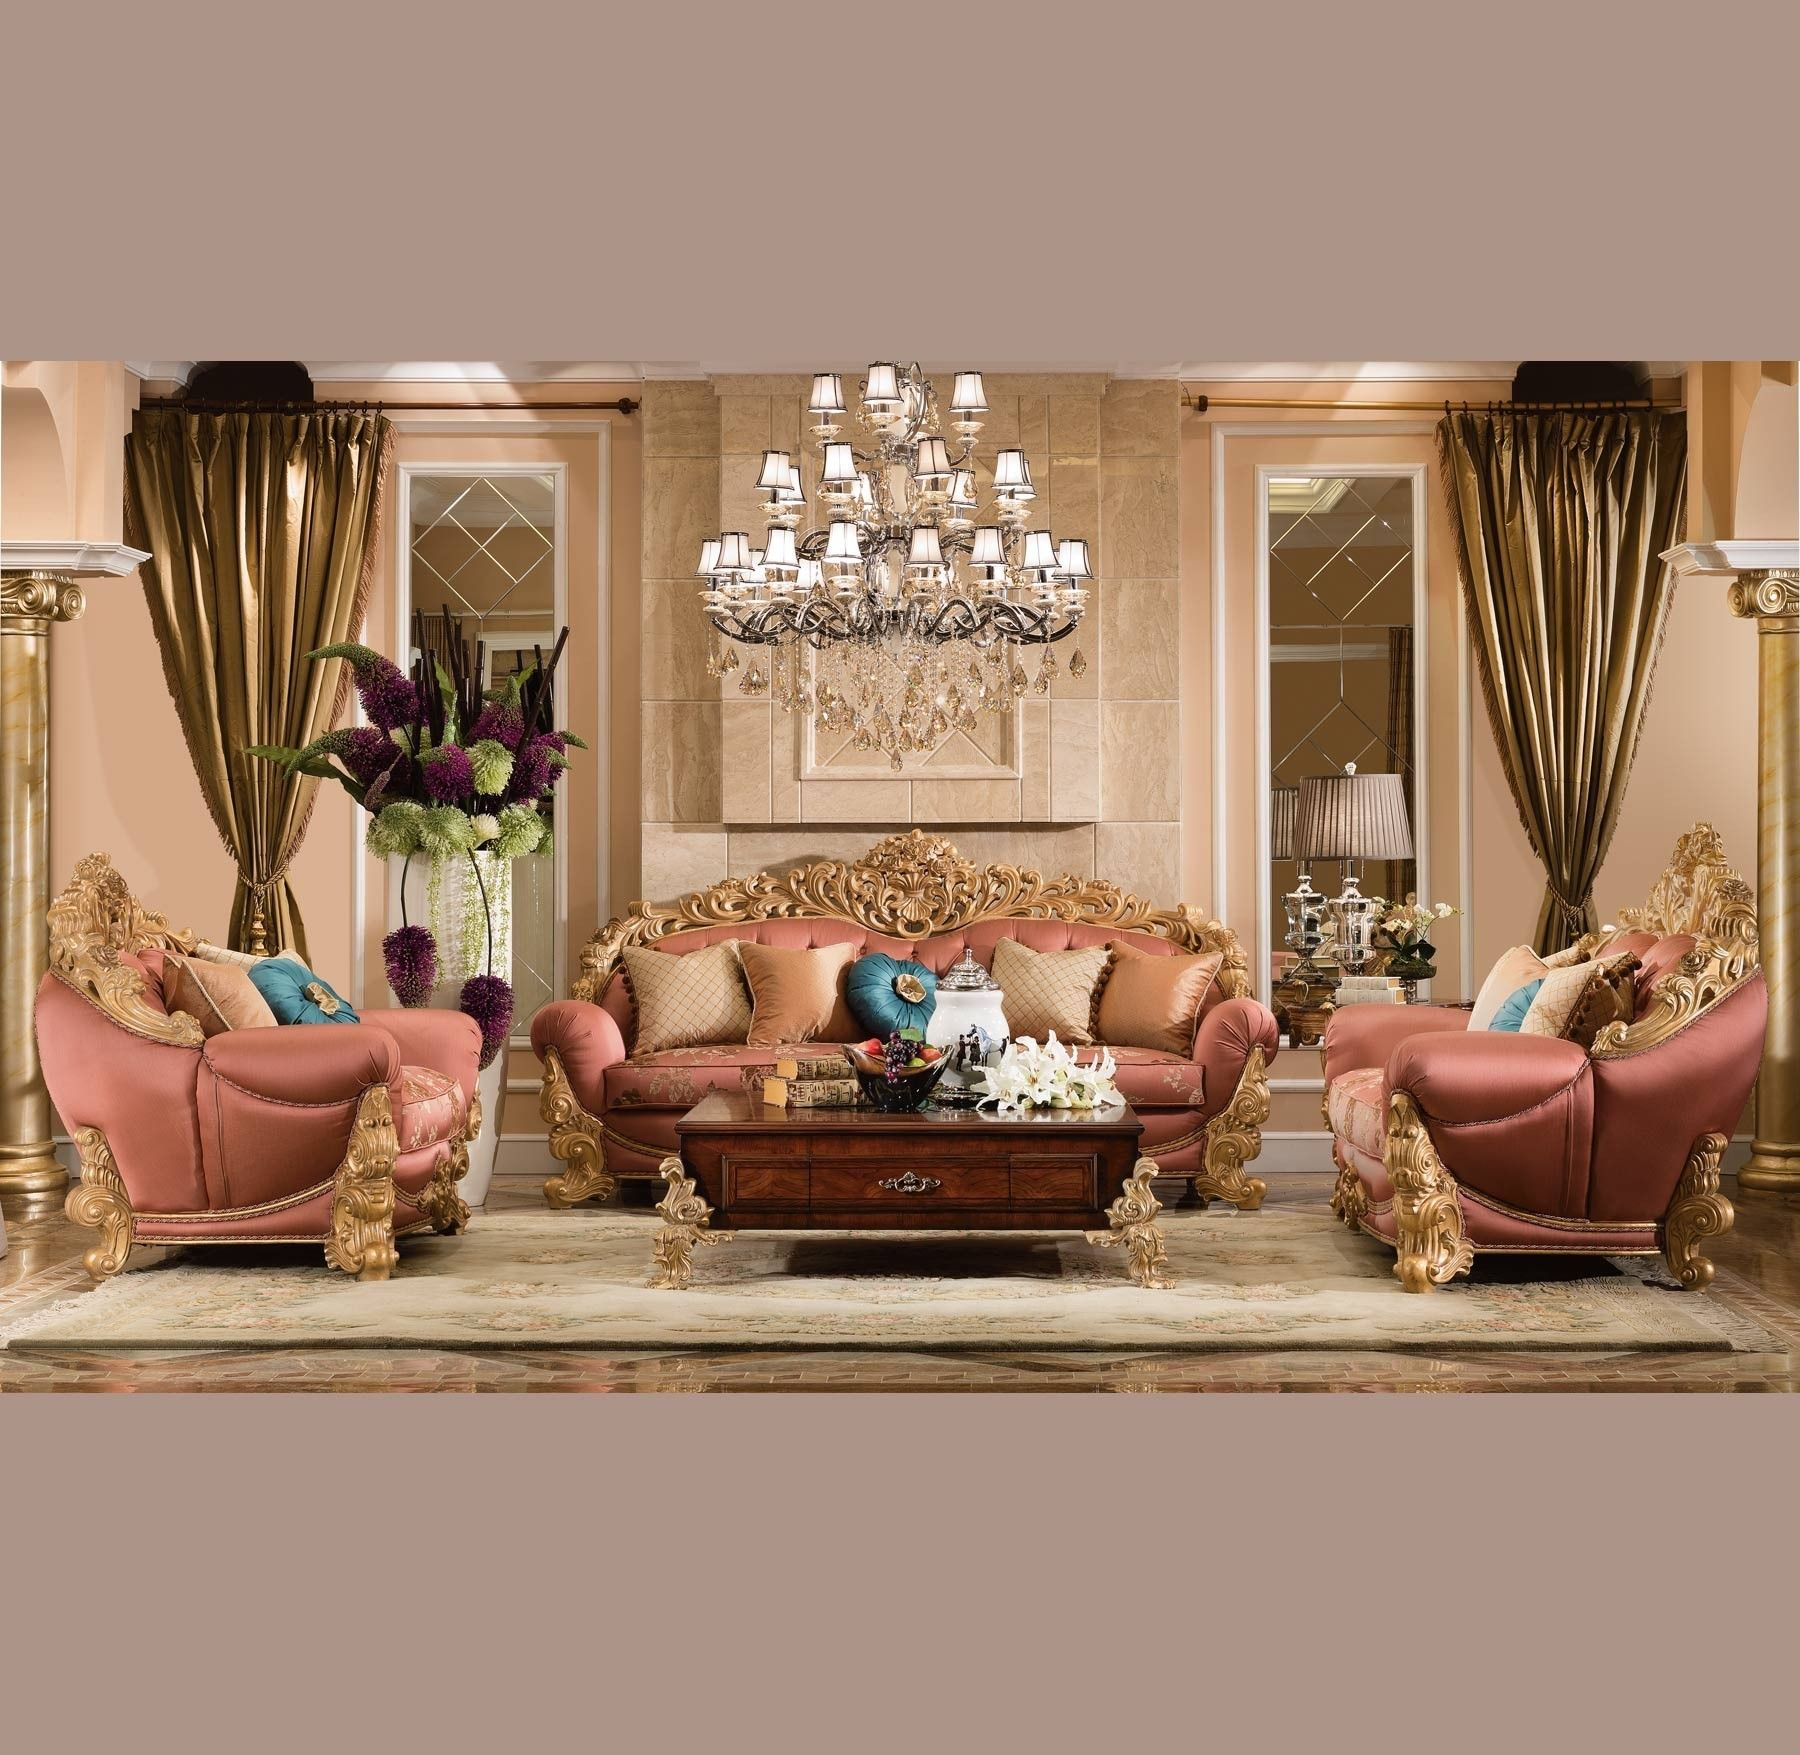 Waldorf 5 Pc Living Room Set Waldorf Living Collection Living Room Sets Gold Living Room Round Dining Room Pc living room decor set by home